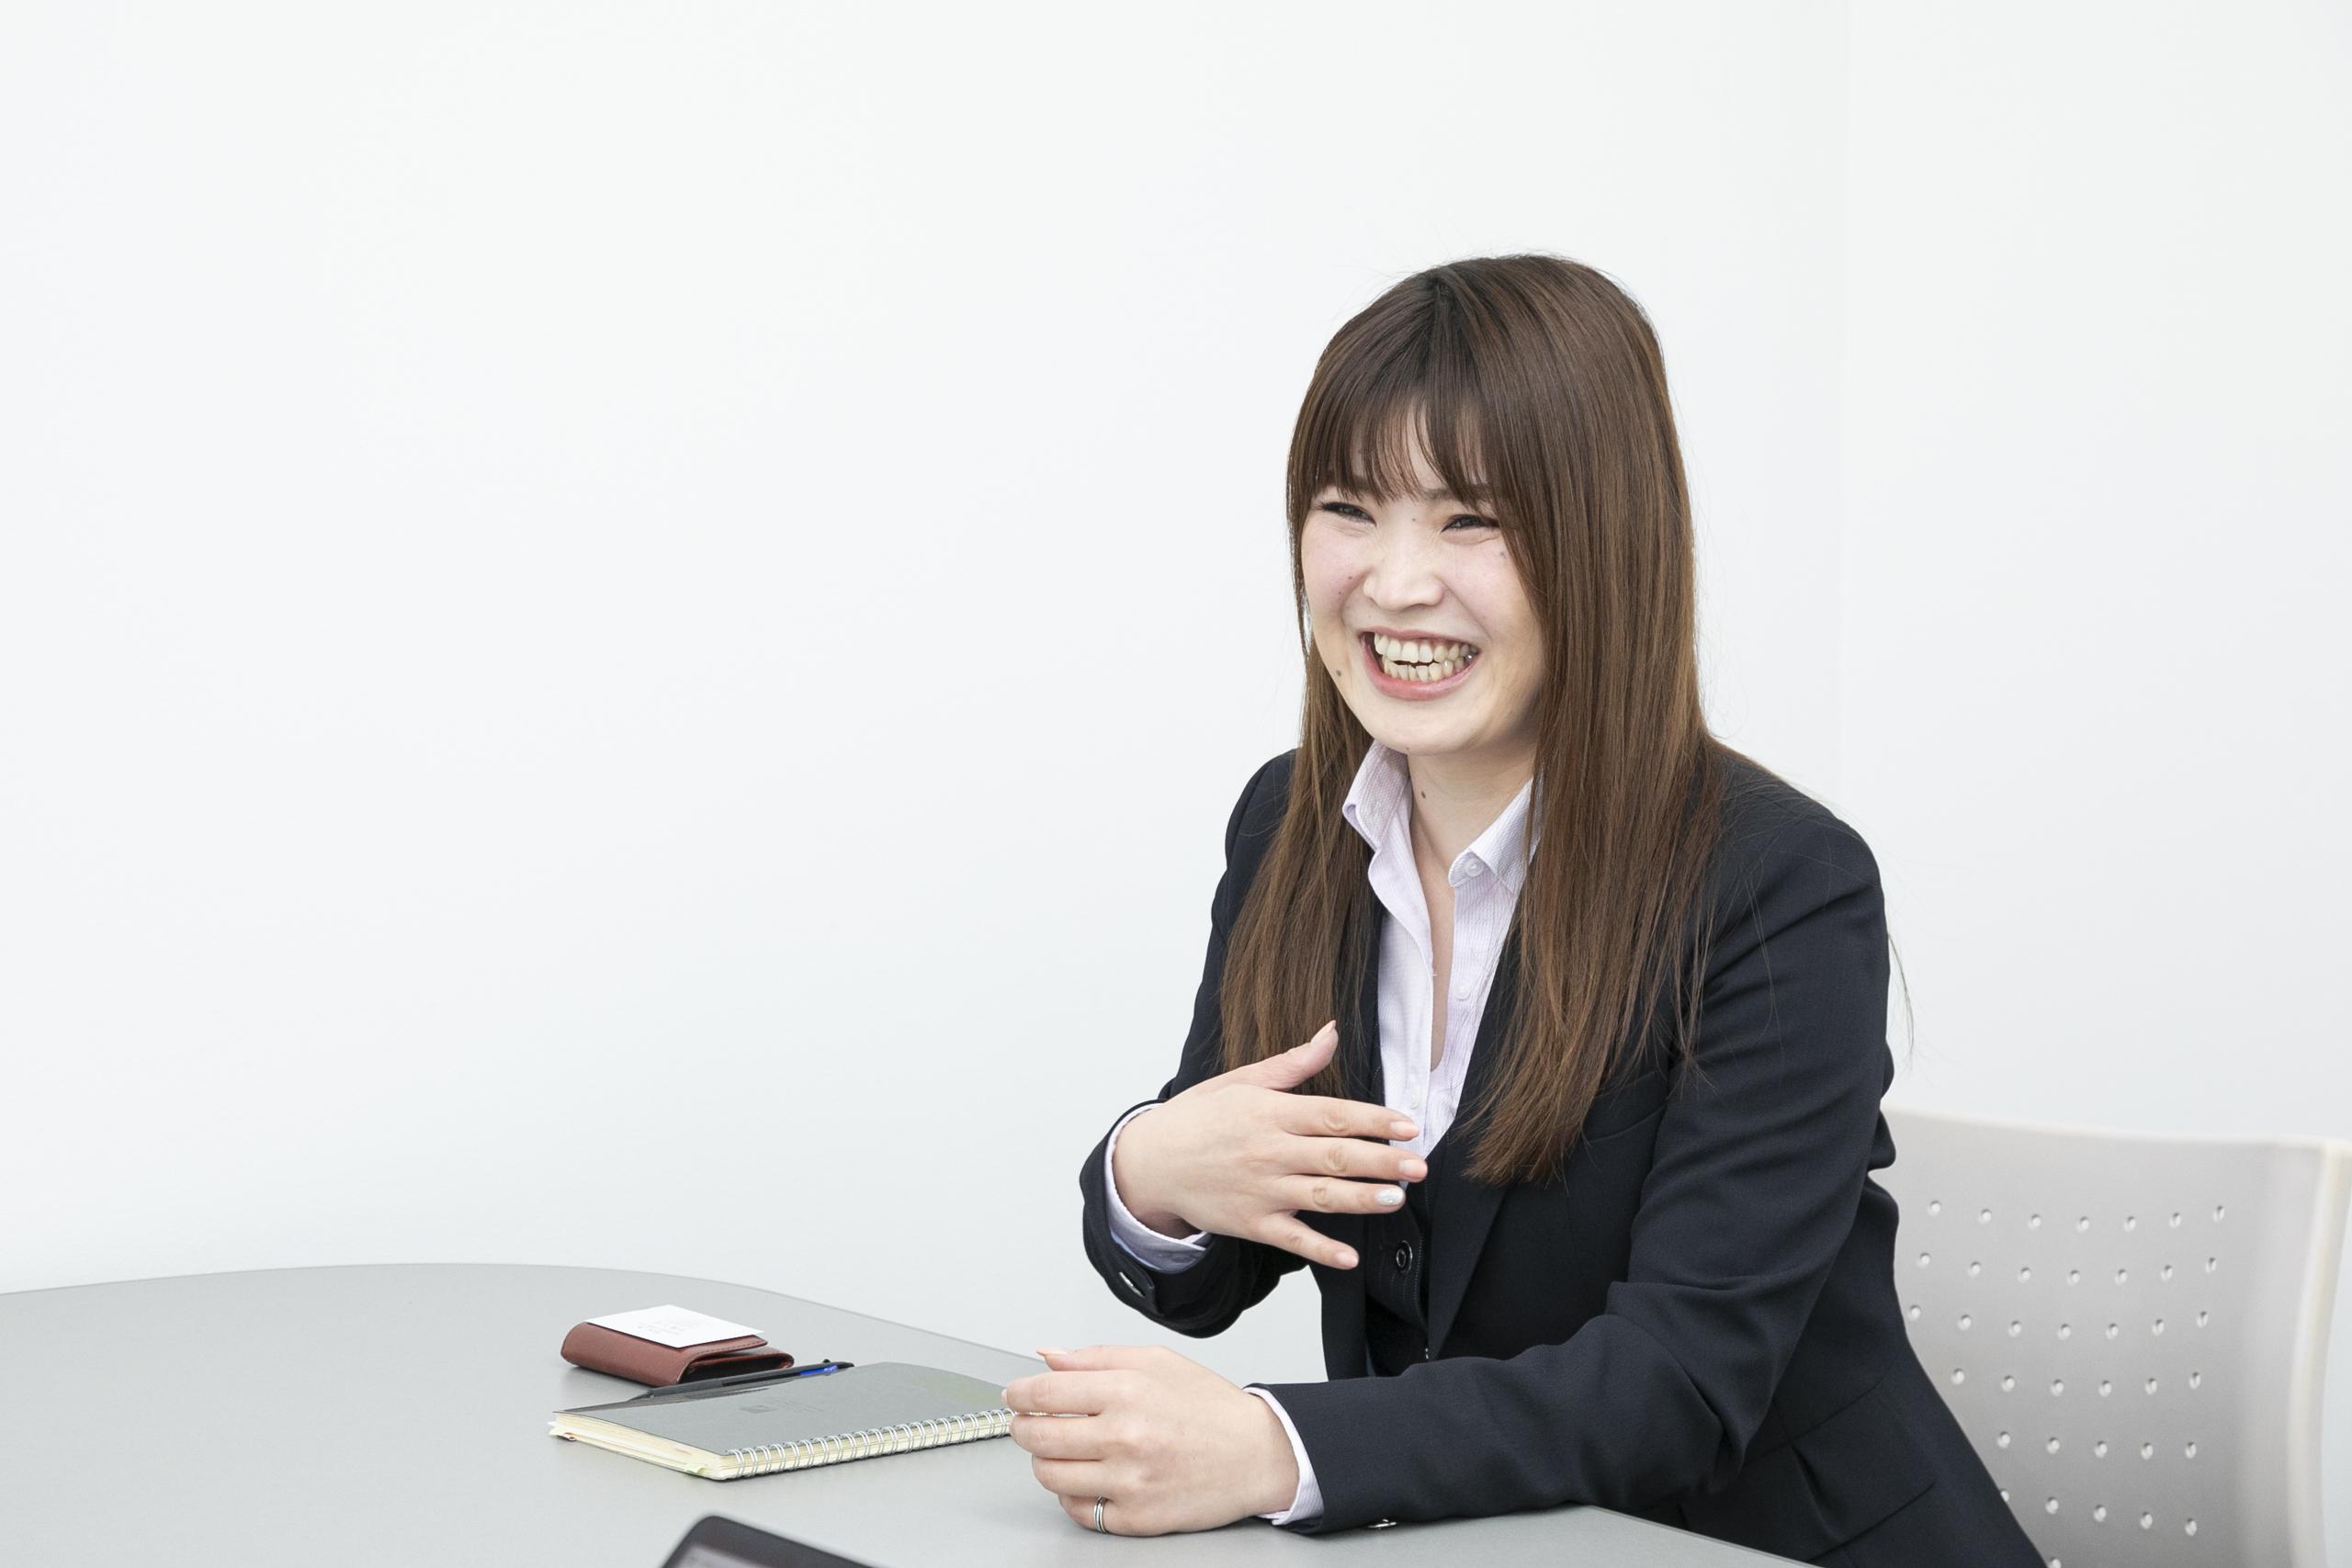 日本電通株式会社人事部主任園田さん